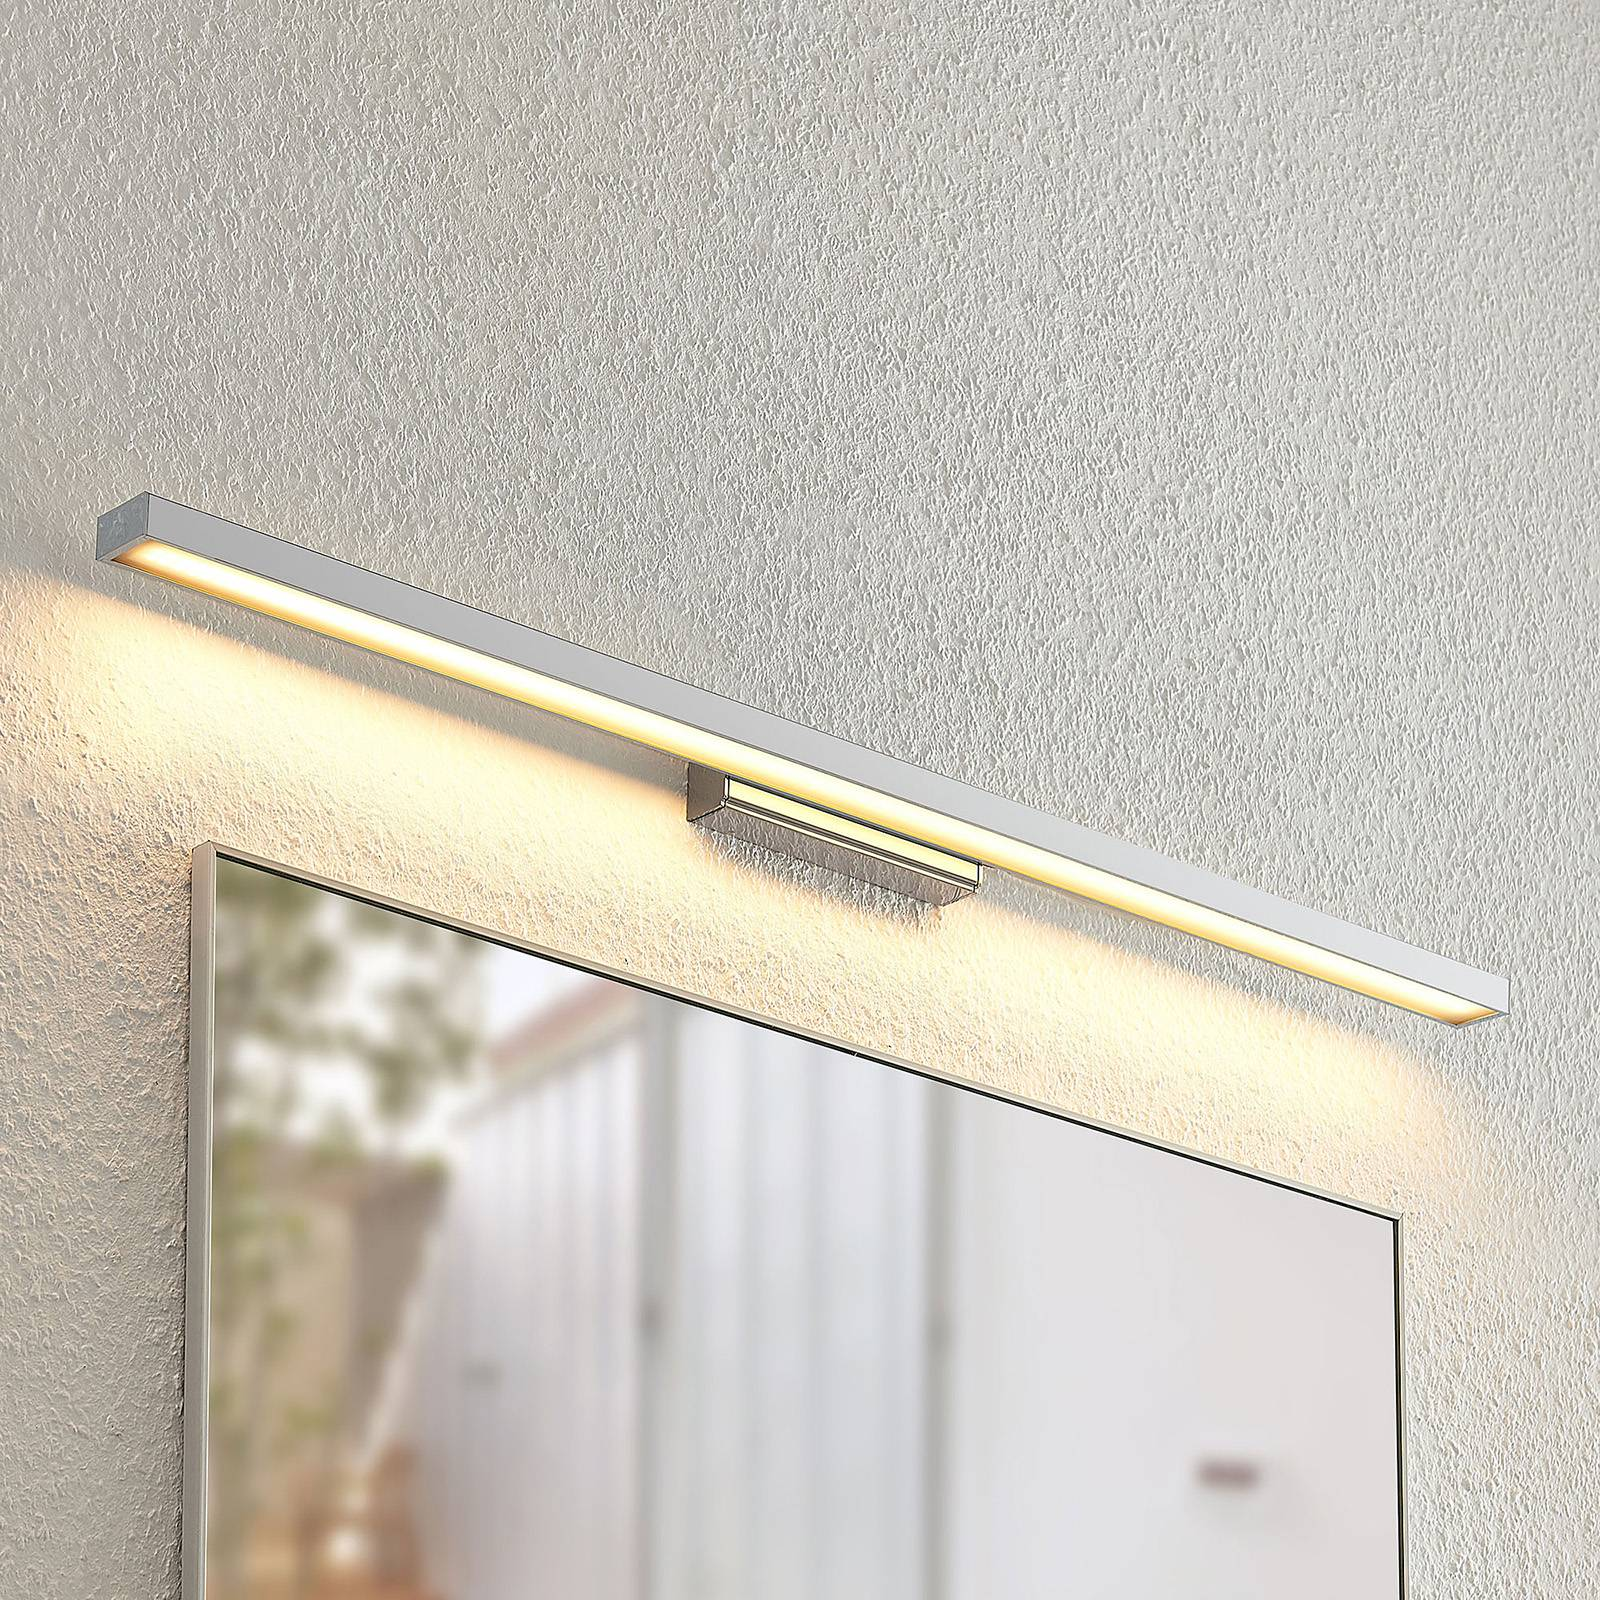 Lindby Alenia -kylpyhuoneen LED-peililamppu, 90 cm